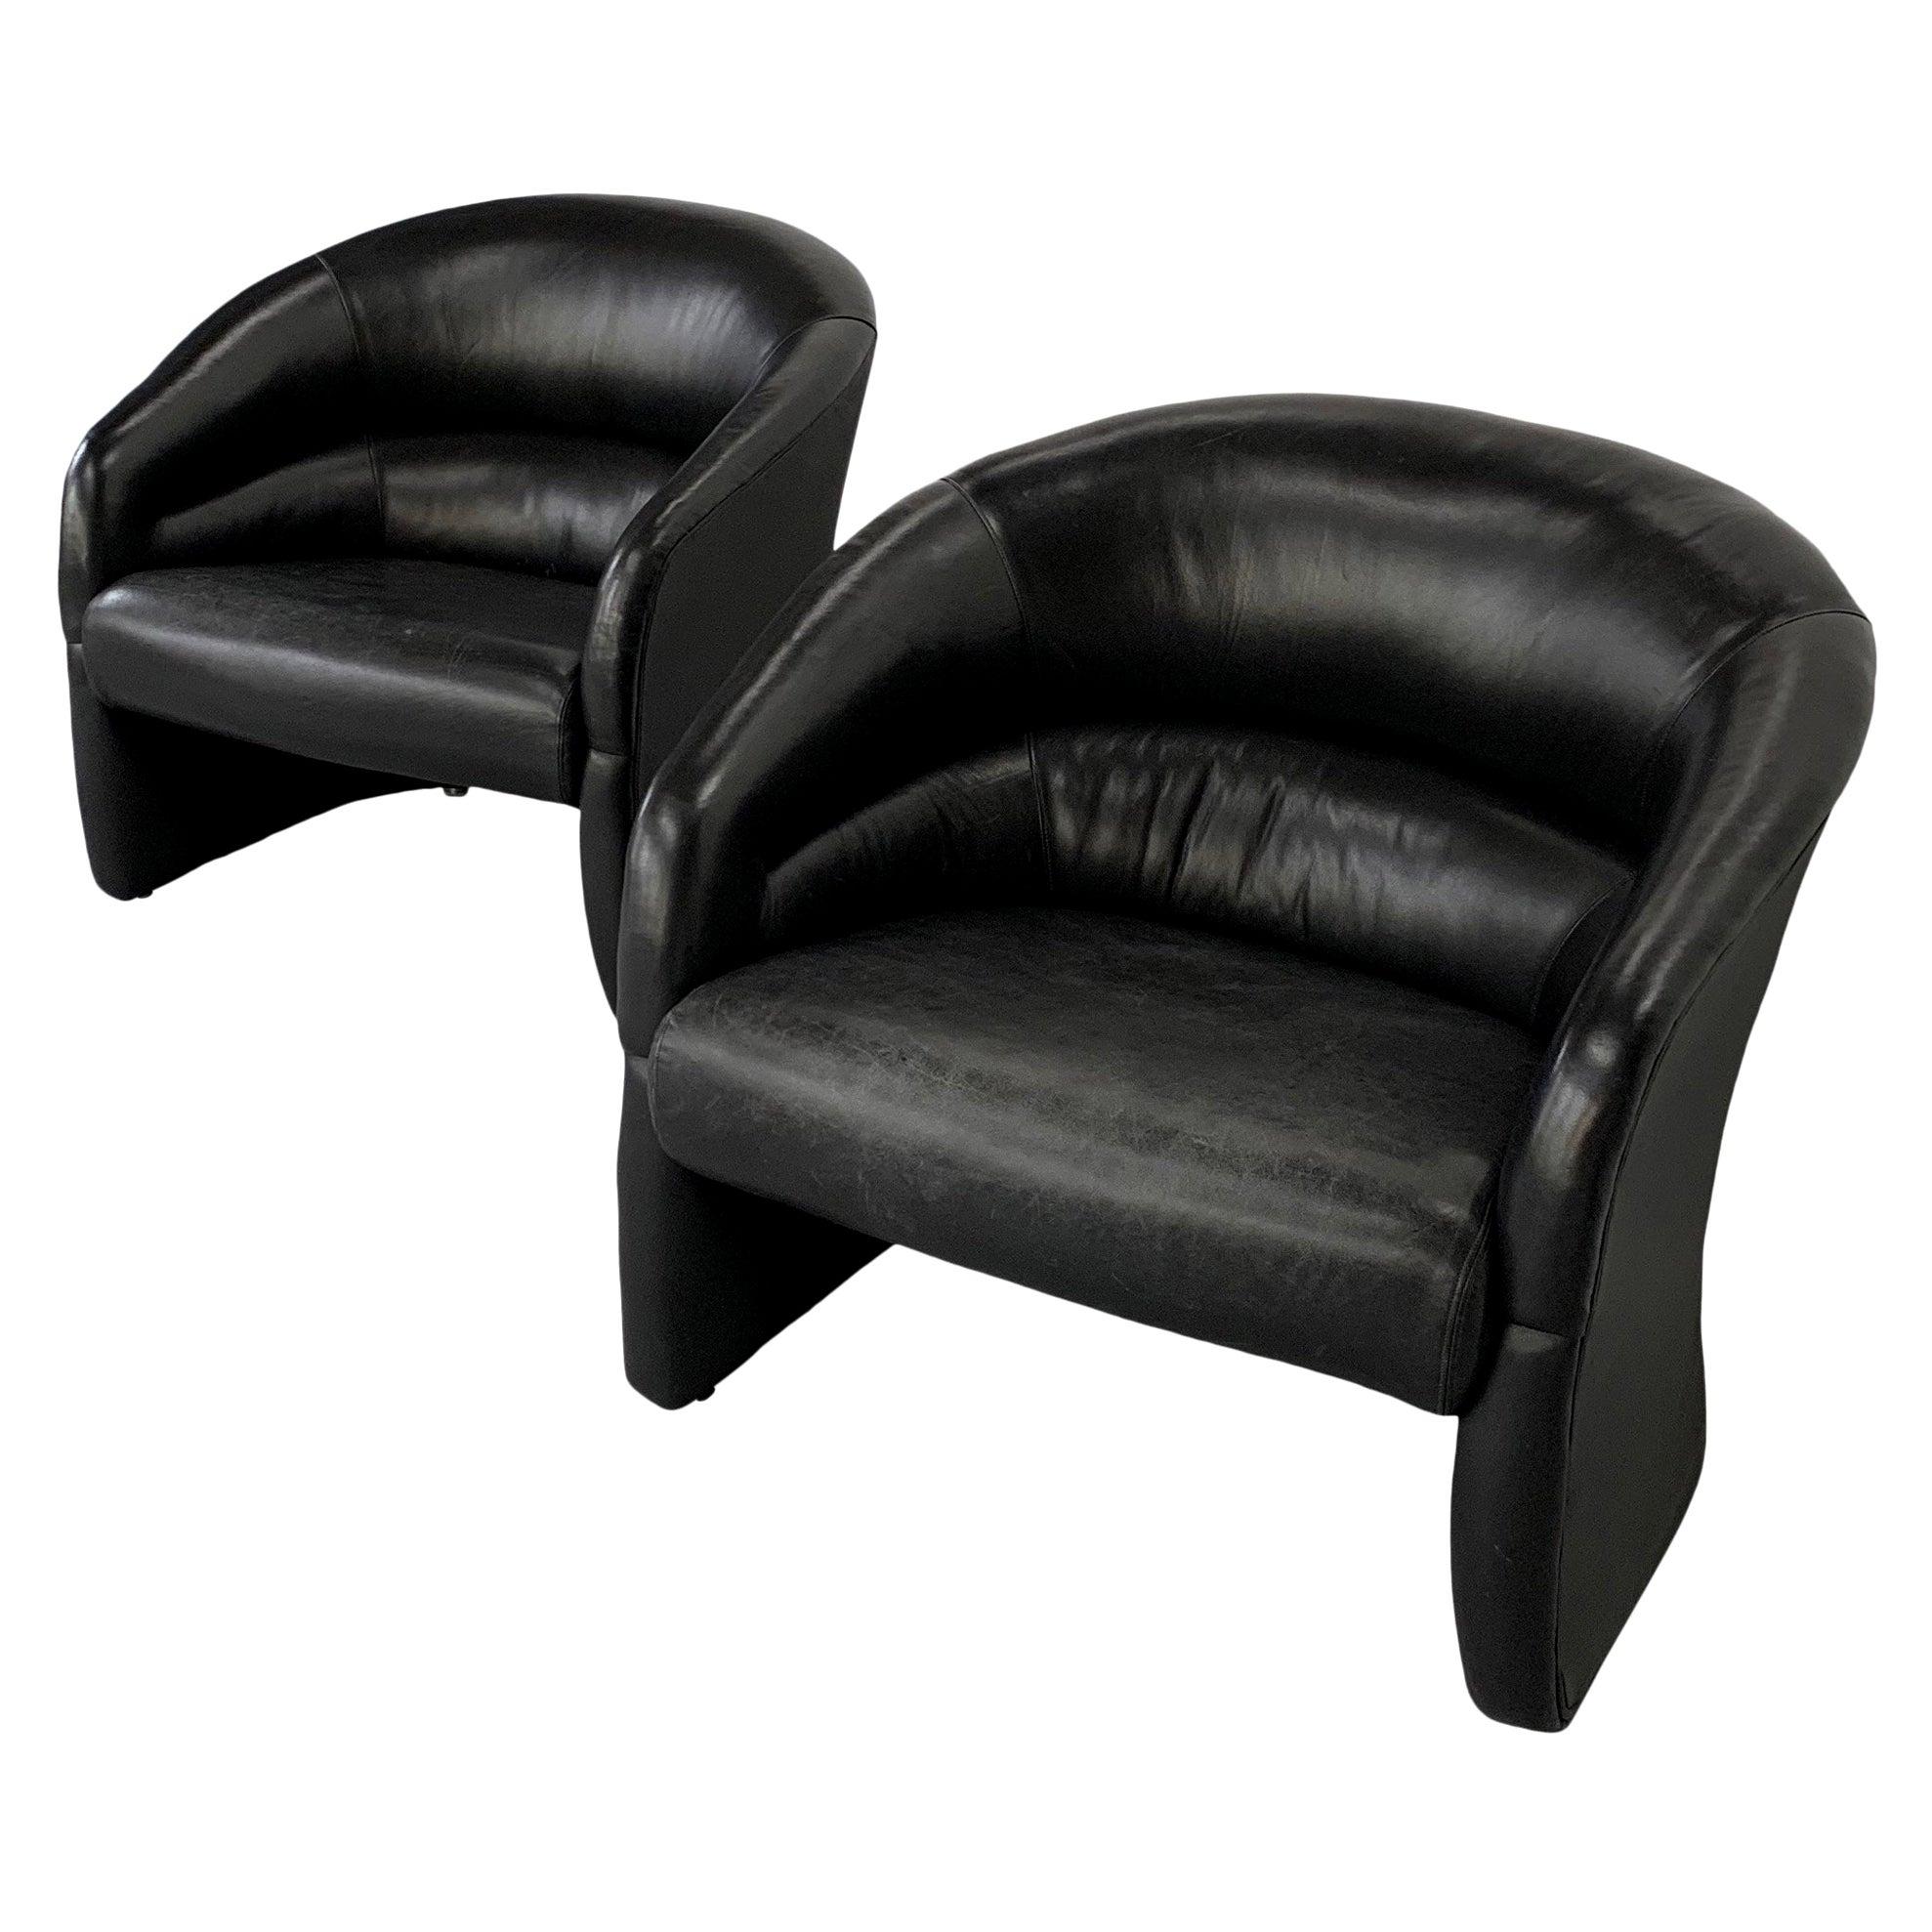 Ward Bennett for Brickel Associates 1970s Leather Barrel Back Club Chairs